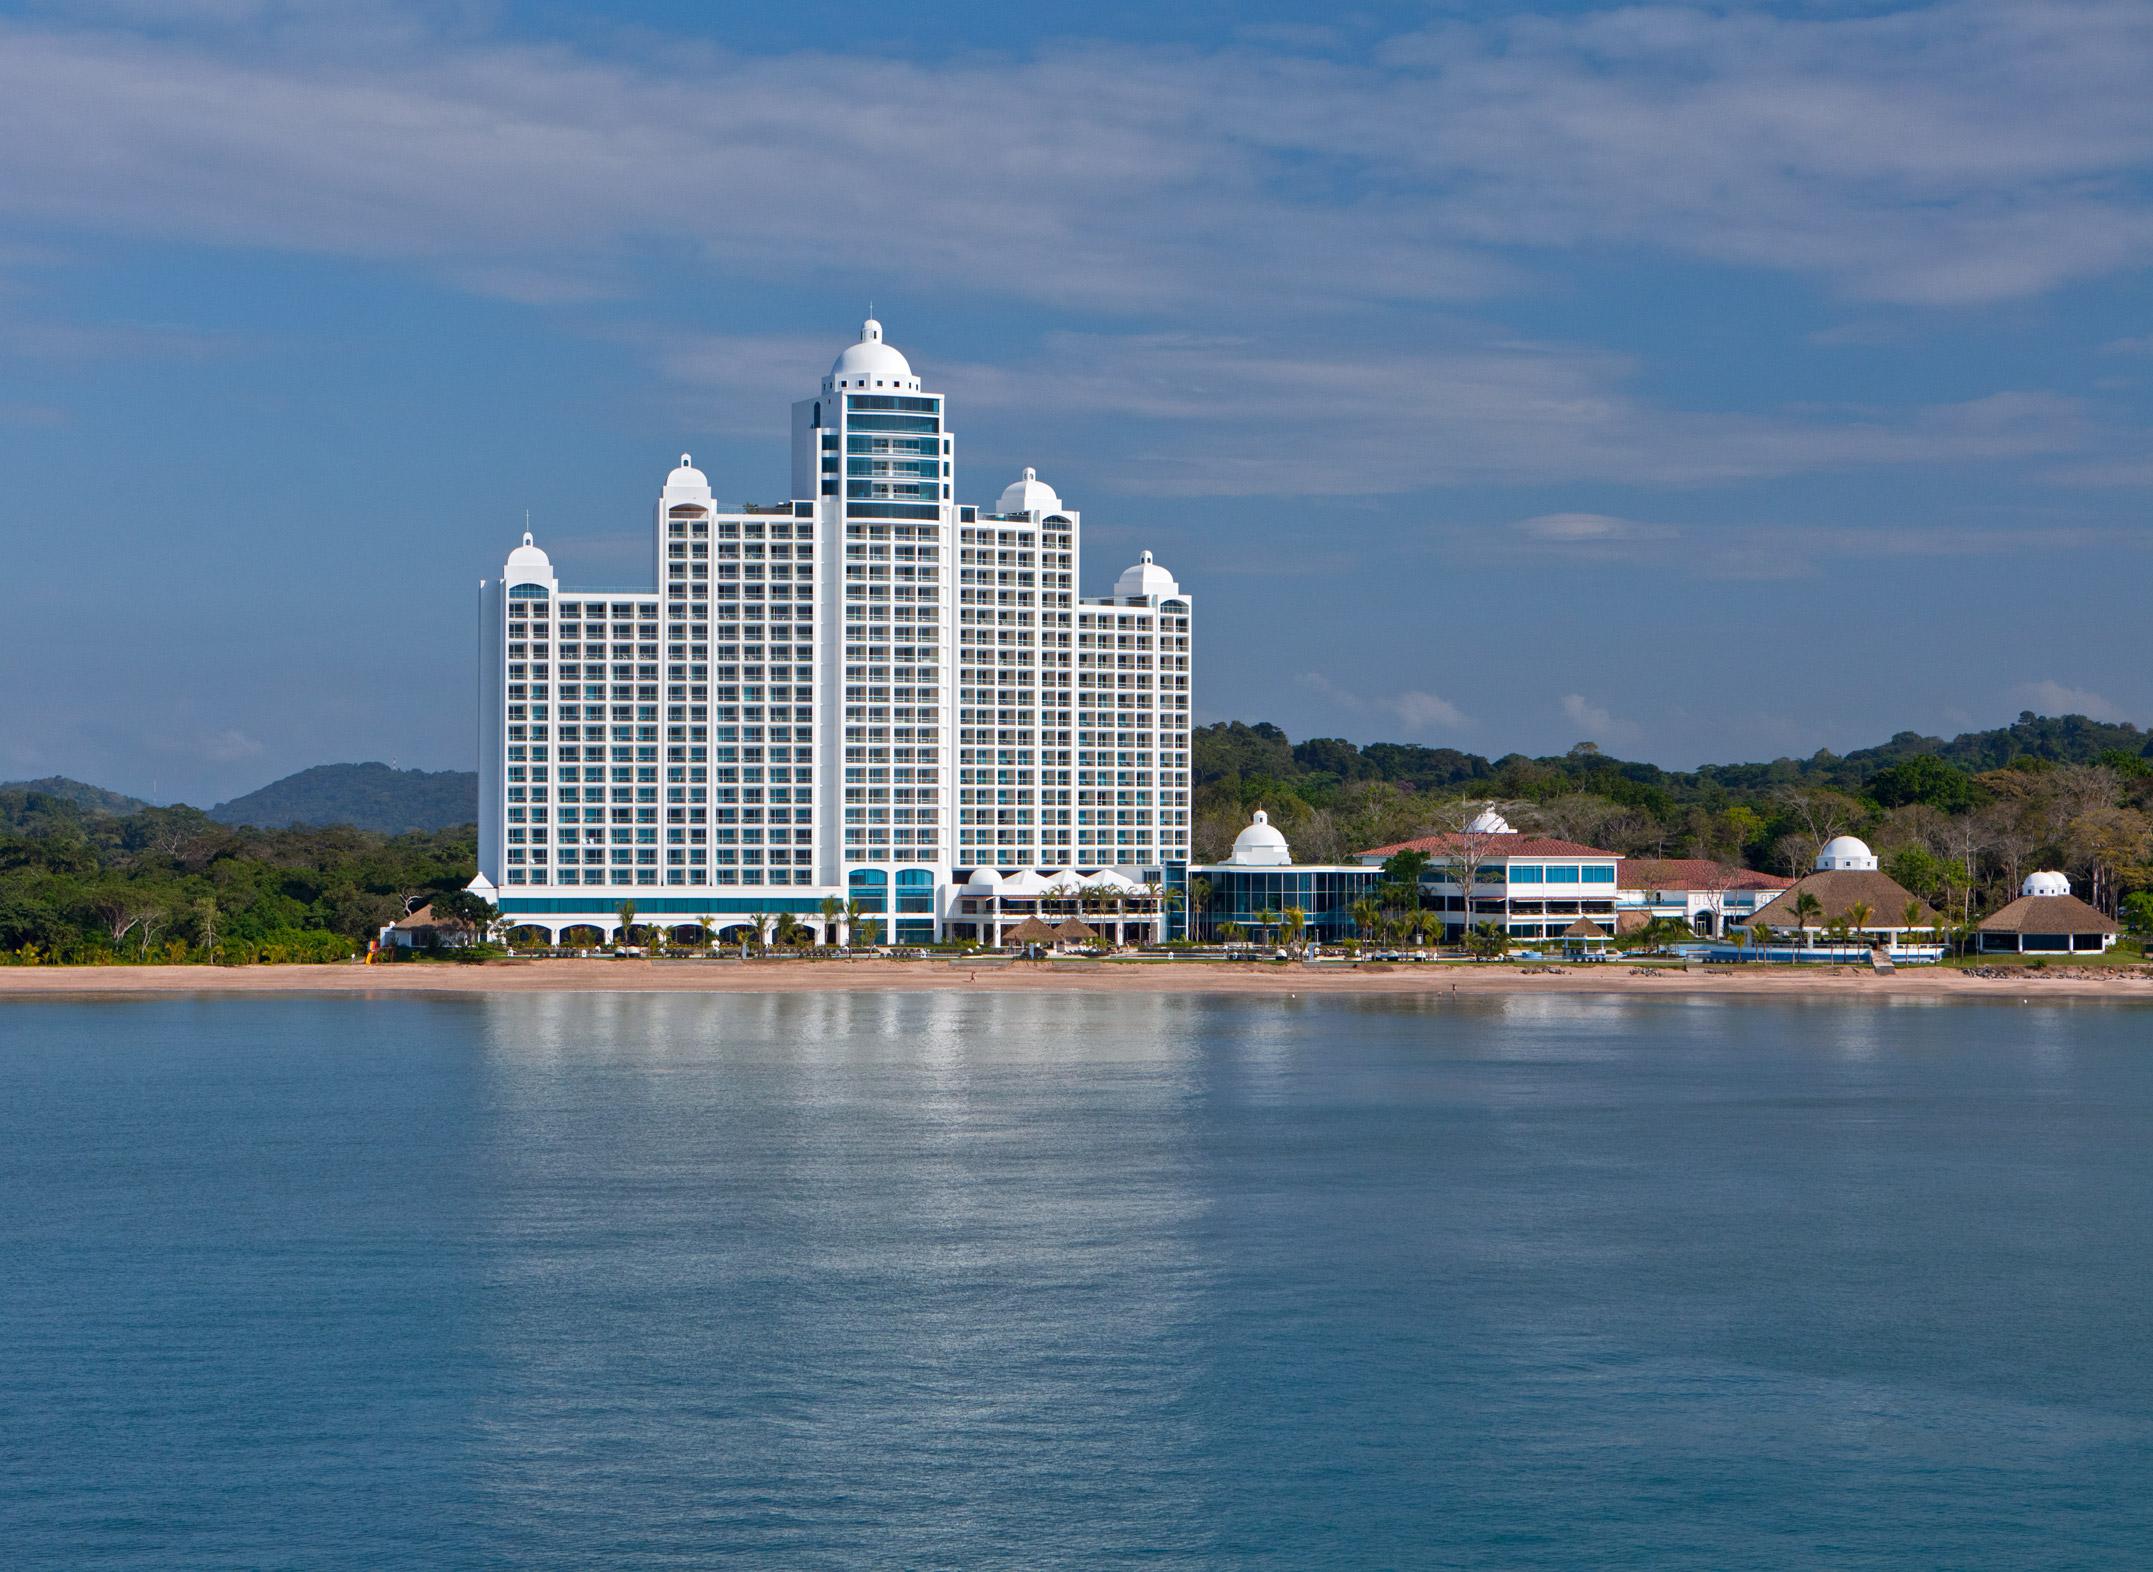 Hotel Playa Bonita Panama